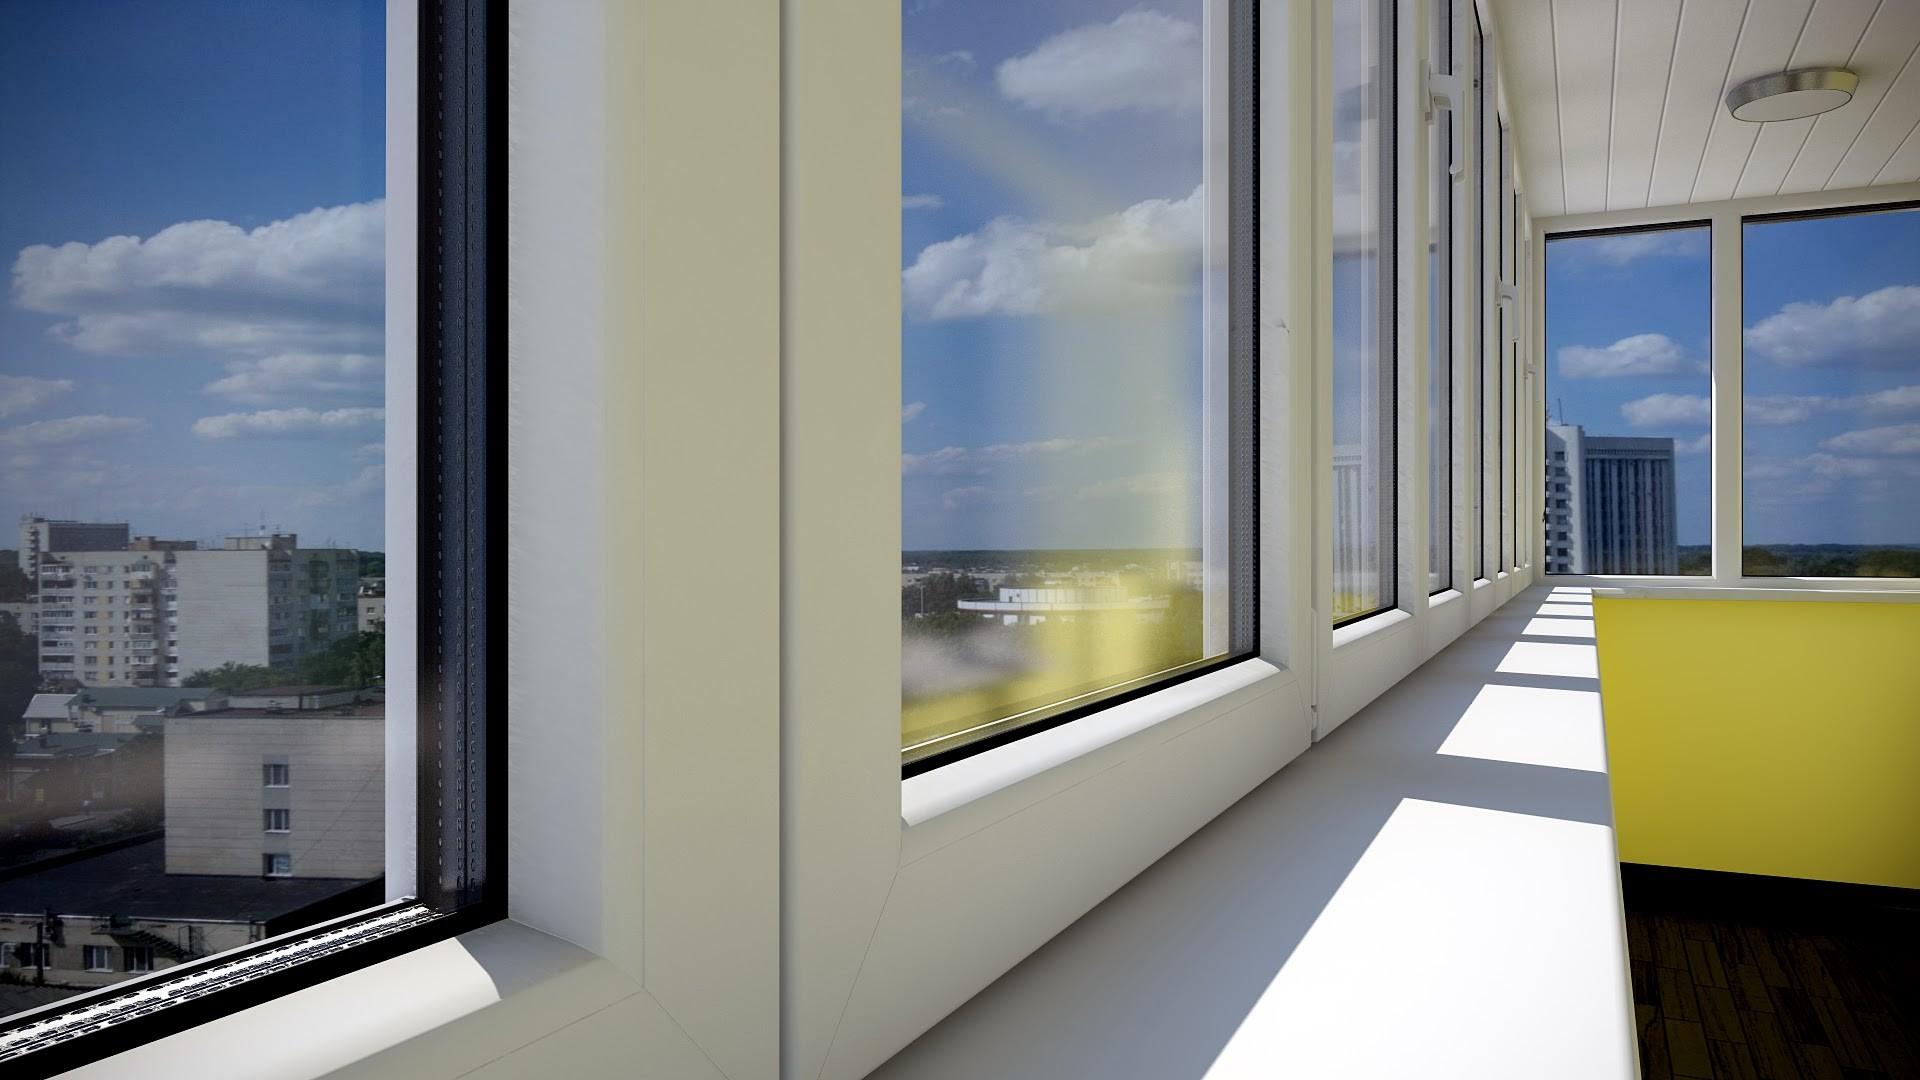 Балкон/лоджия - part 2.